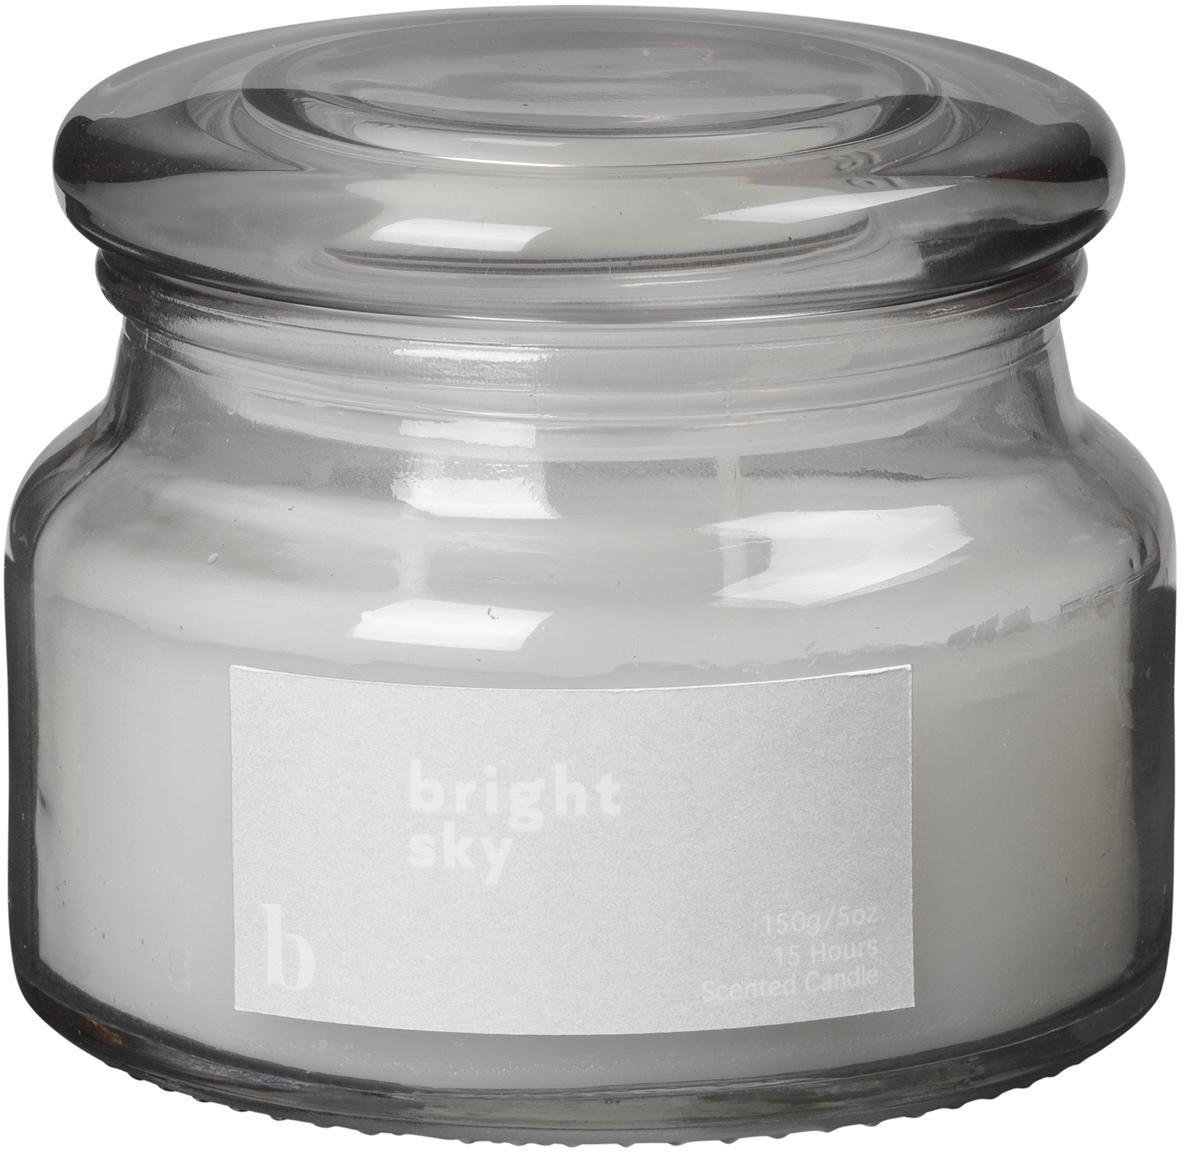 Vela perfumada Bright Sky, Recipiente: vidrio, Gris, Ø 10 x Al 8 cm